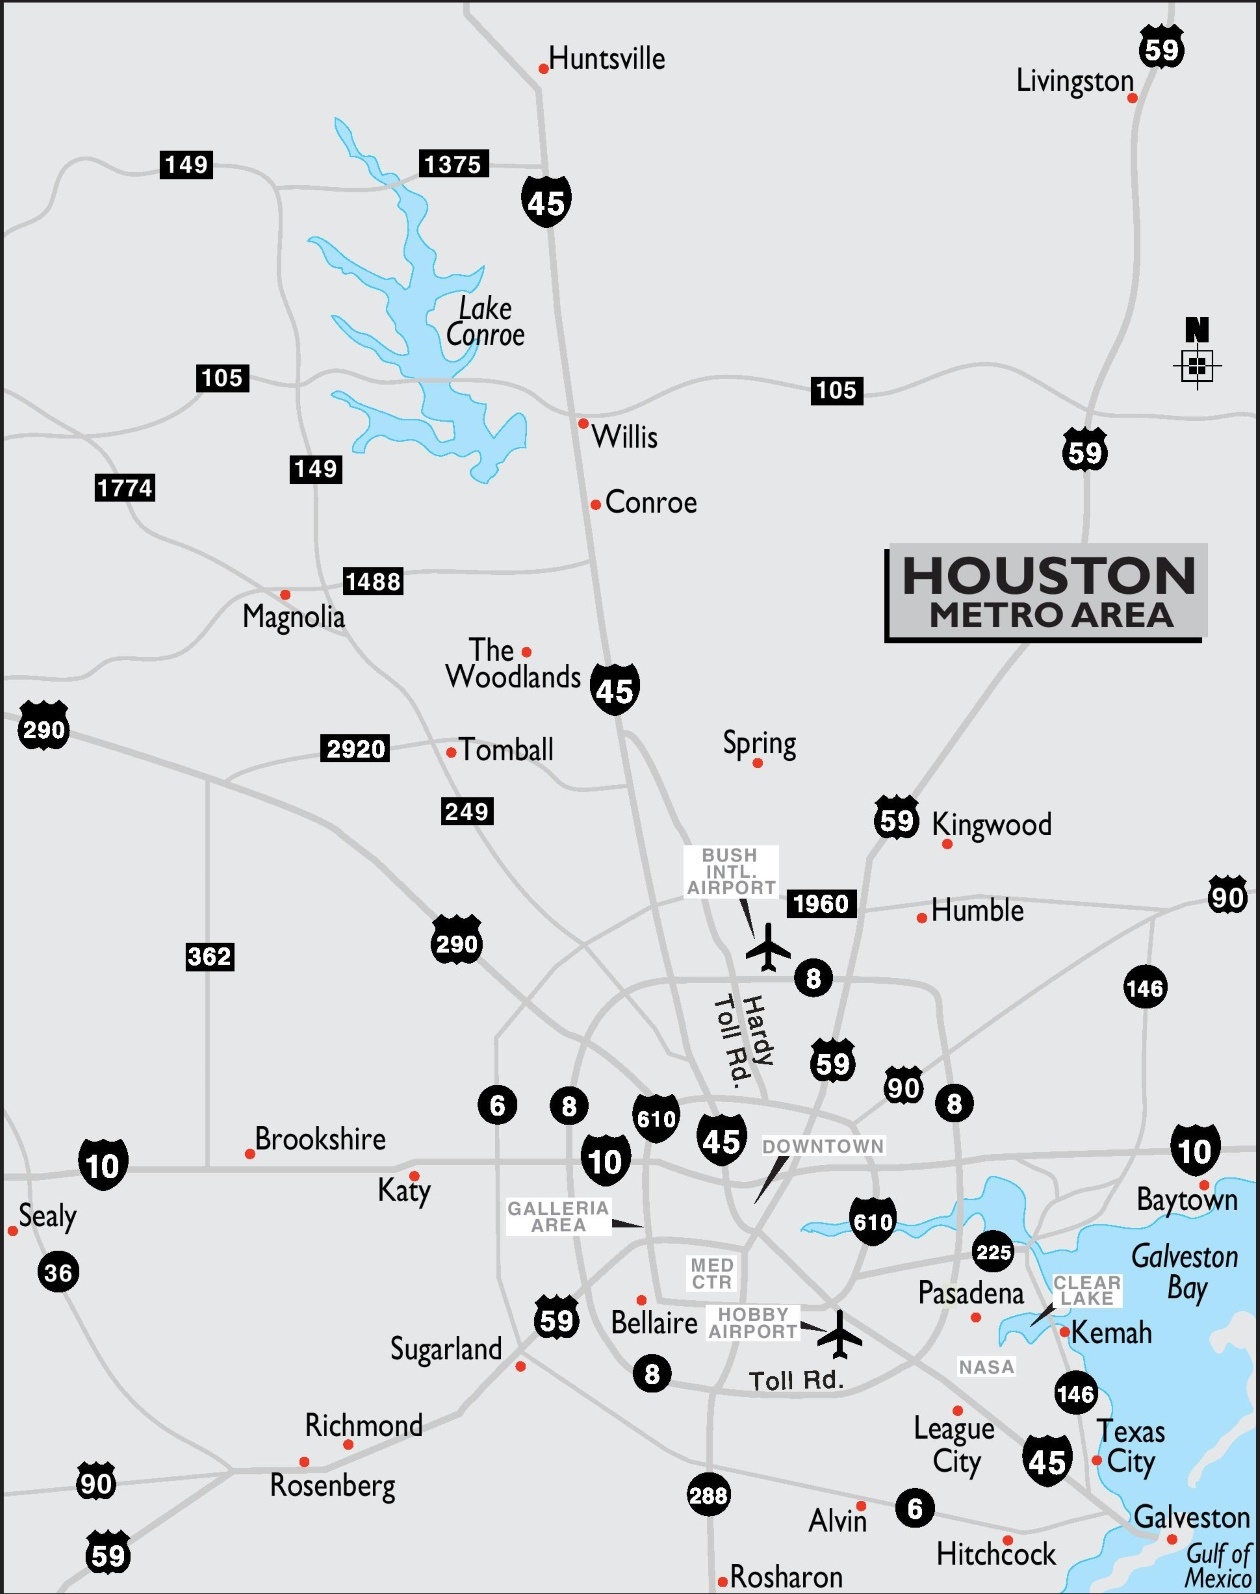 Houston Metro Area Map - Houston metro area map